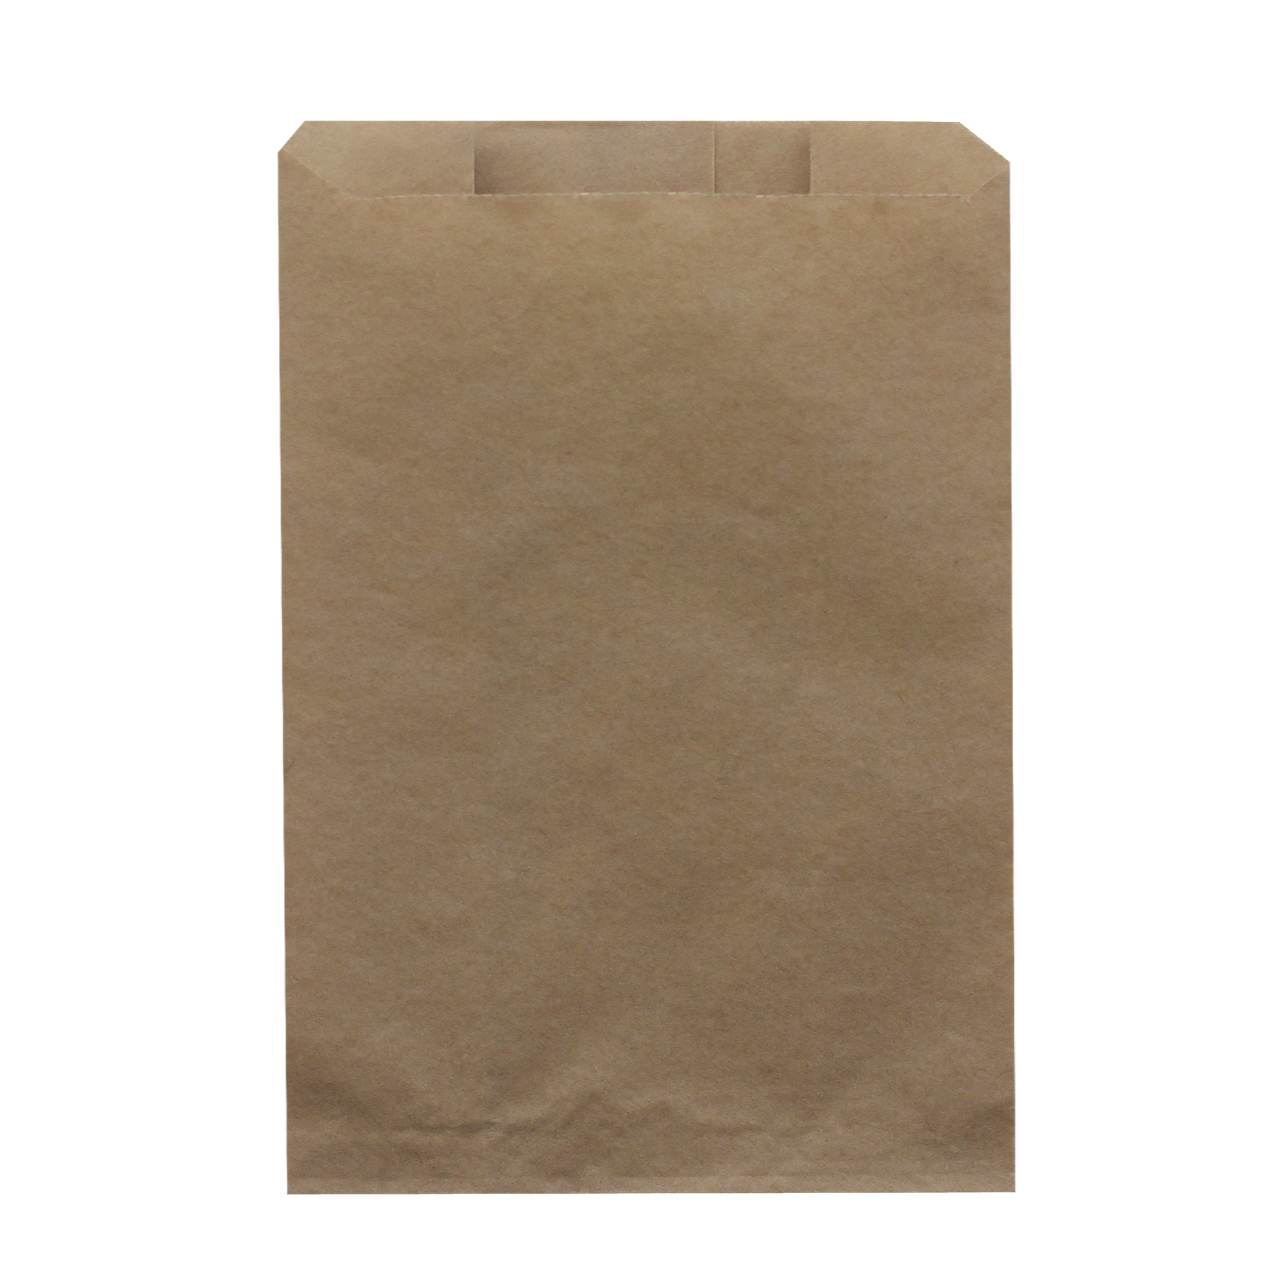 Пакет паперовий 360*220*50 100шт  Крафт (911)